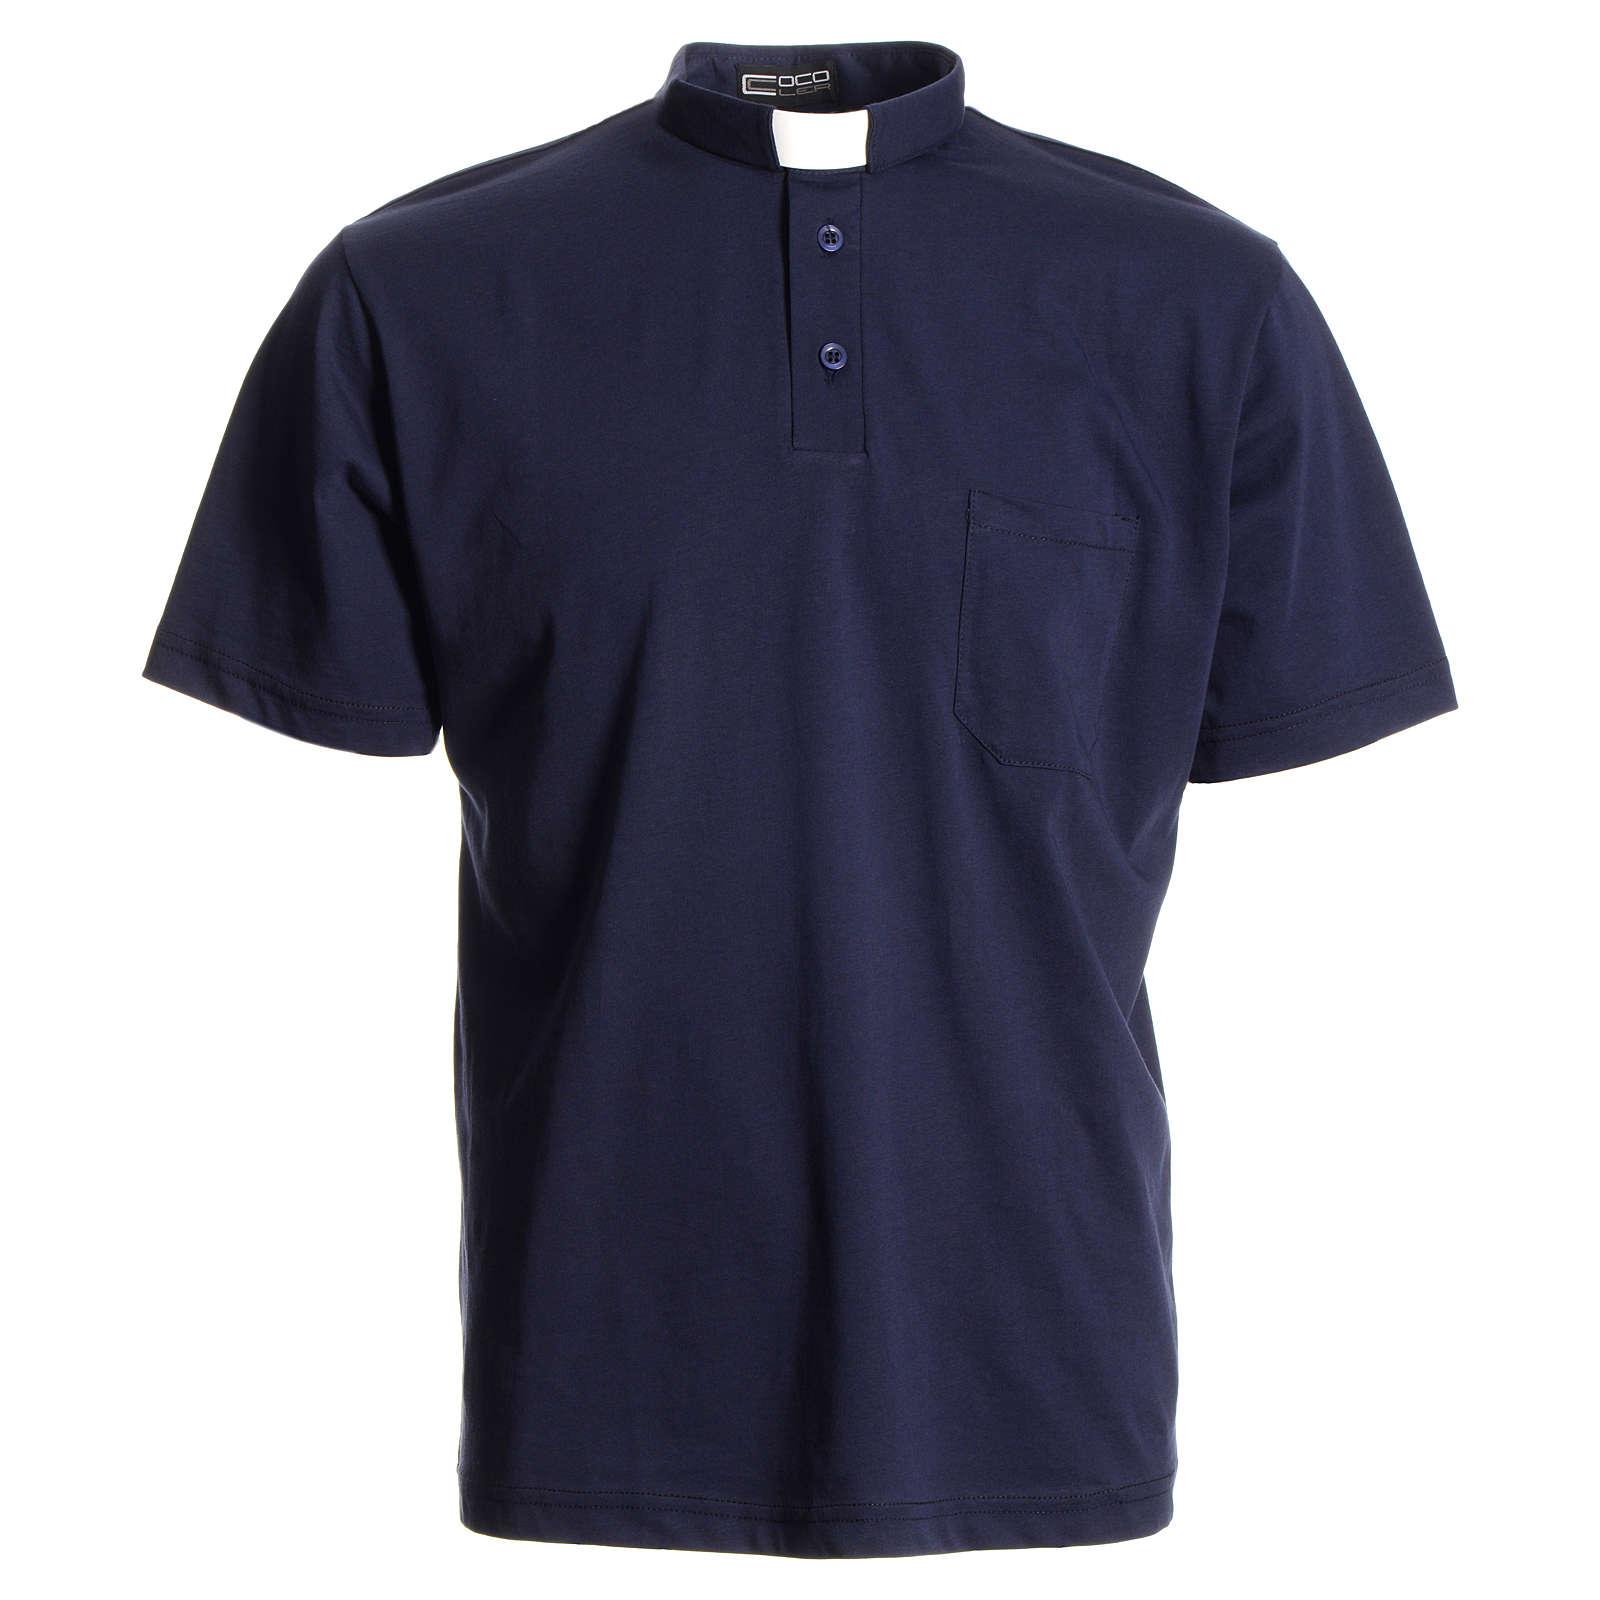 Polo camiseta clergy azul oscuro 100% algodón 4